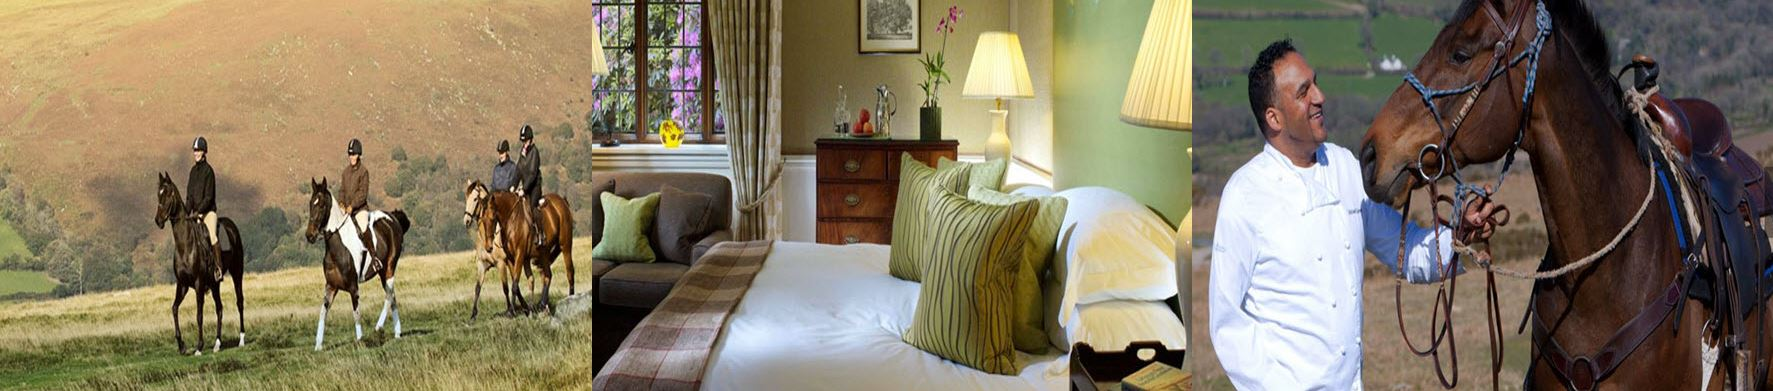 Luxury breaks gidleigh park hotel